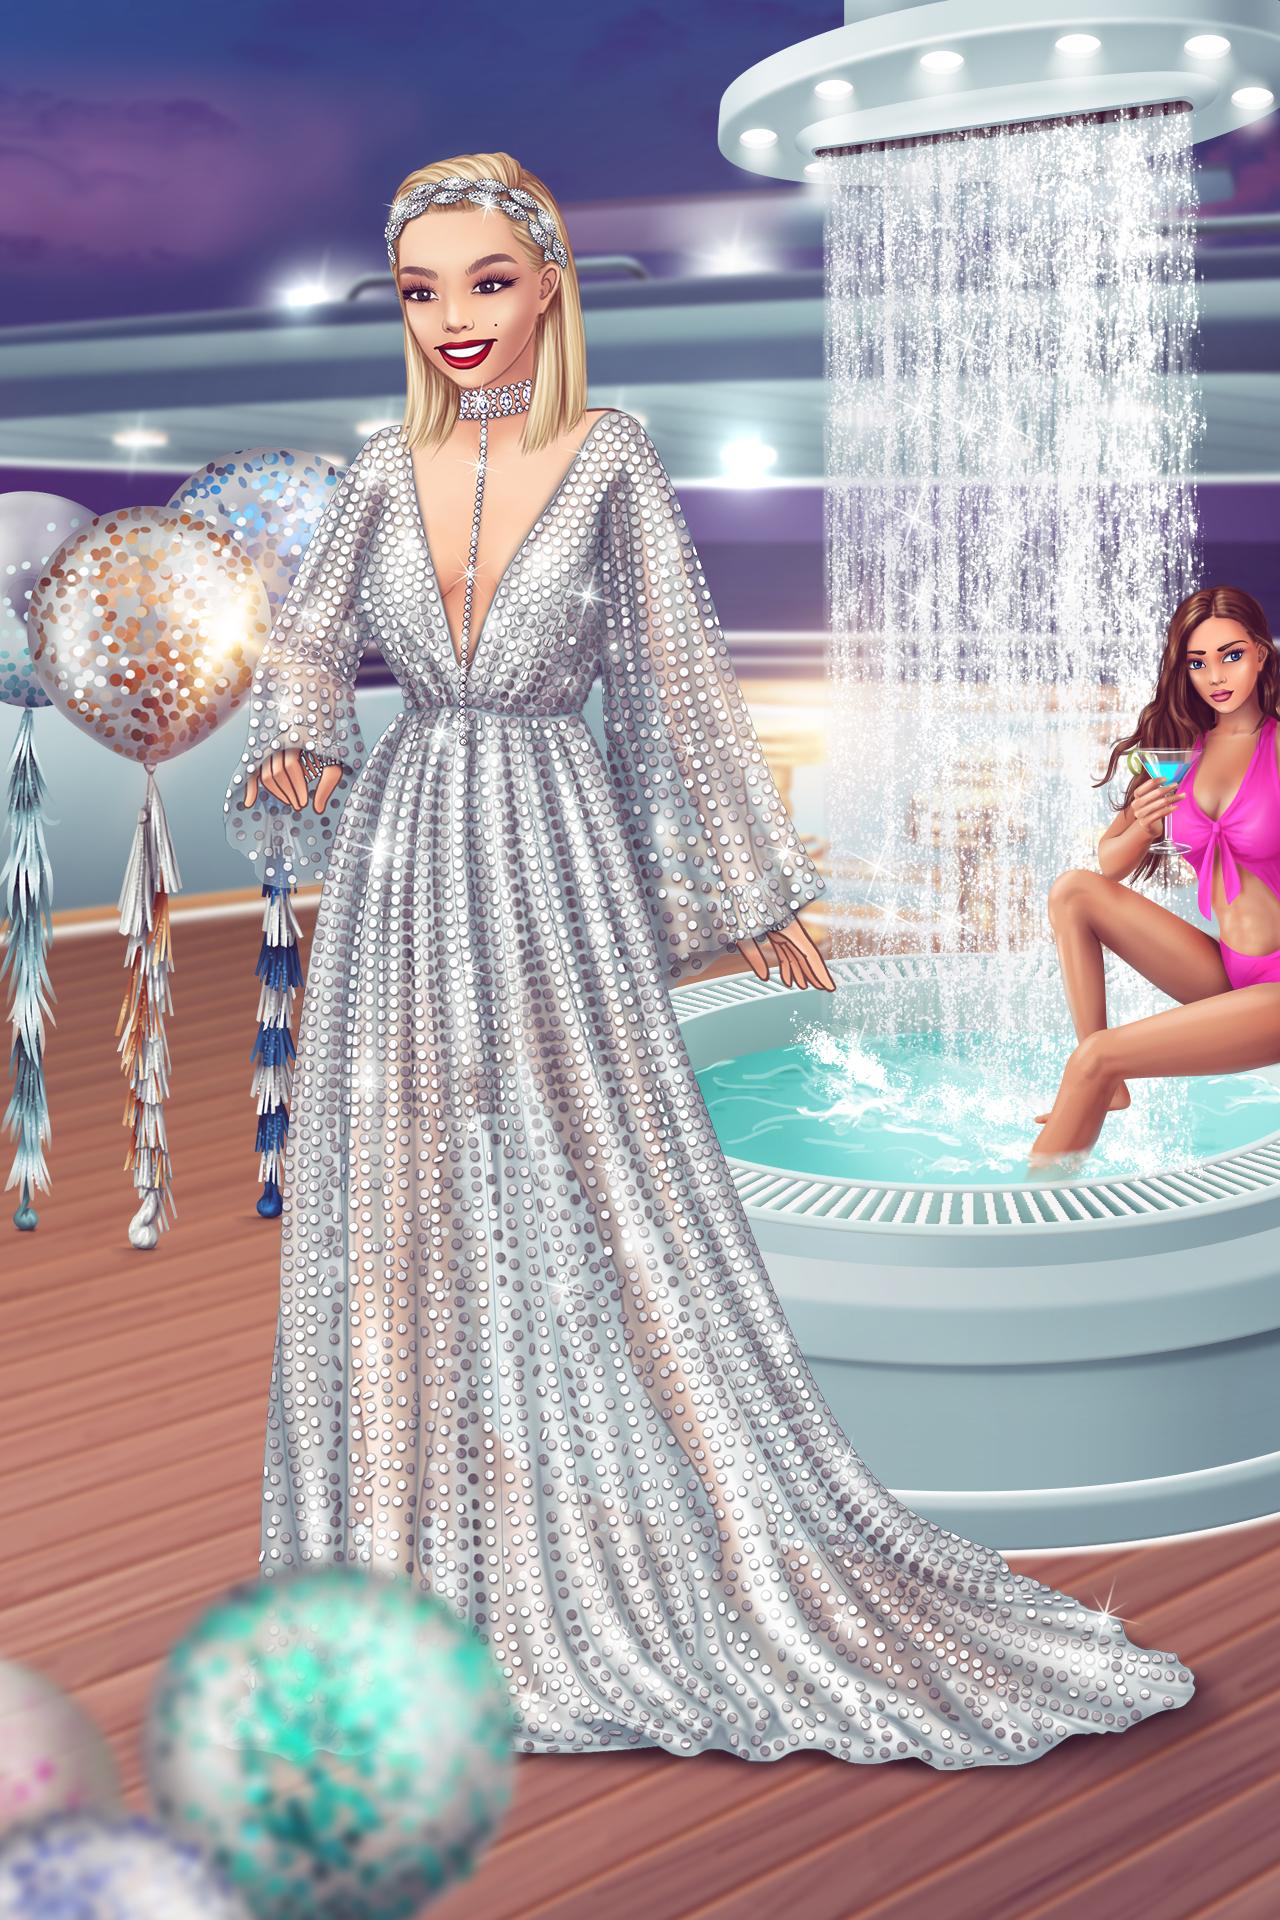 Event Yacht Party LadyPopular LadyPopularFashionArena